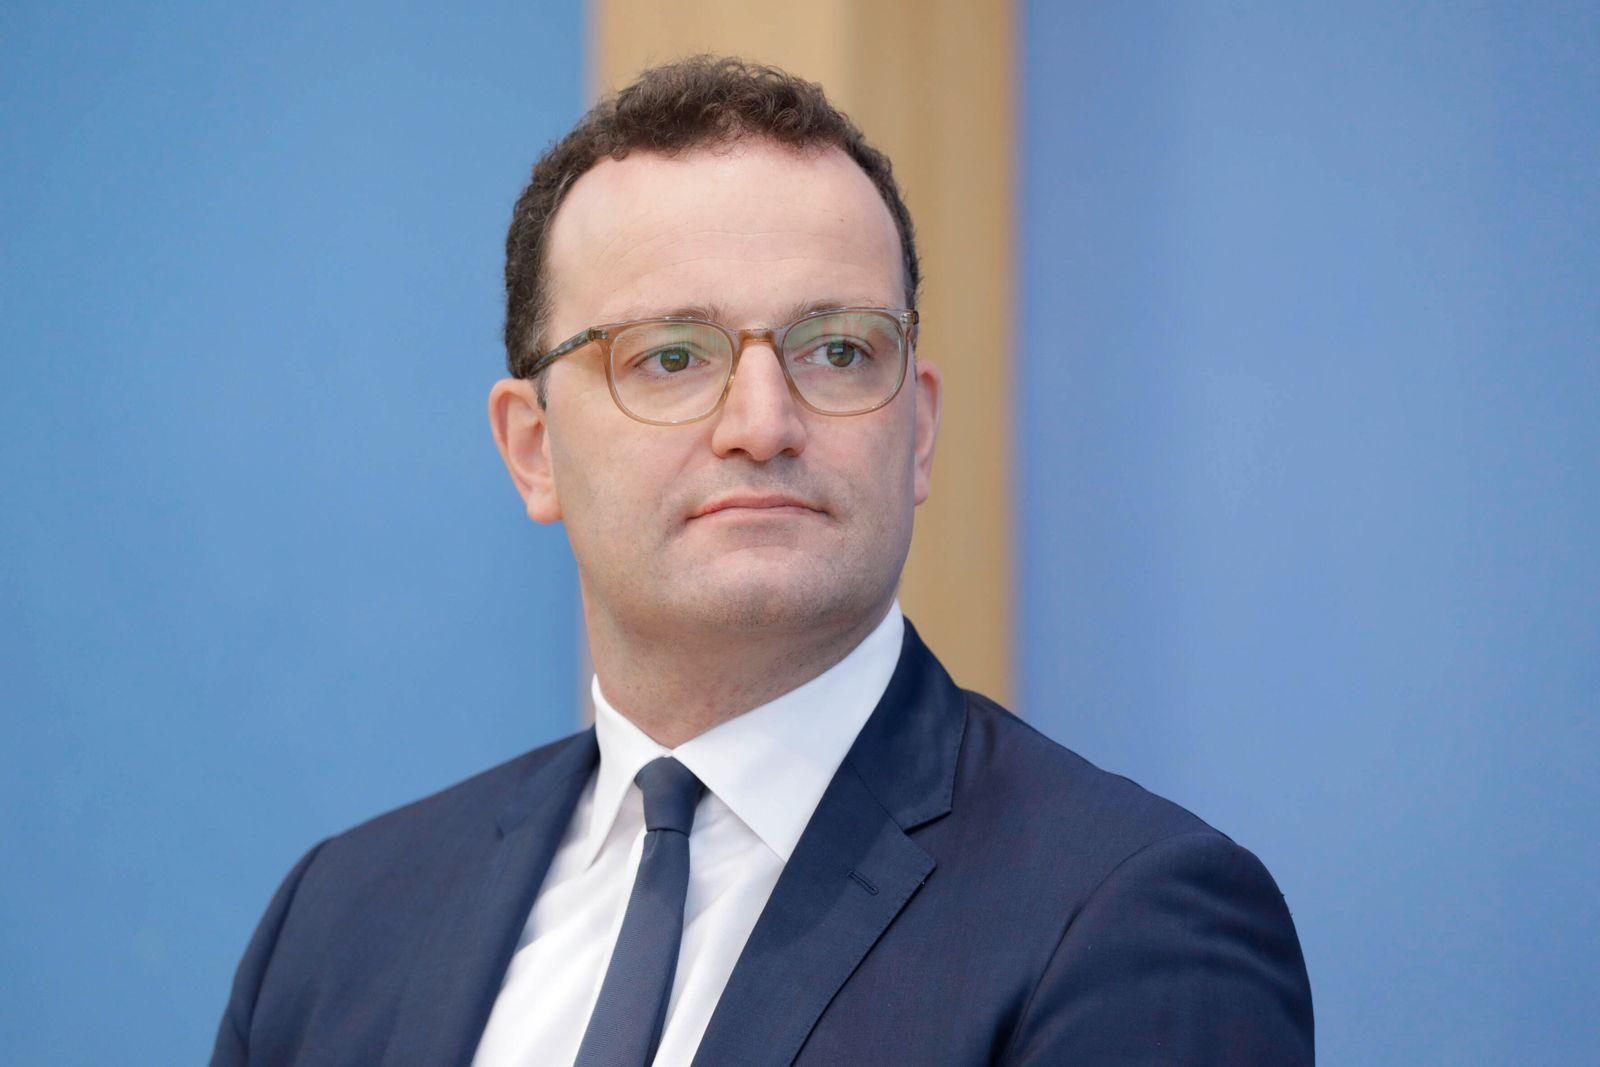 Jens Spahn, Bundesminister fuer Gesundheit, CDU, PK zu - 100 Tage Corona-Warn-App, DEU, Berlin, 23.09.2020 *** Jens Spah